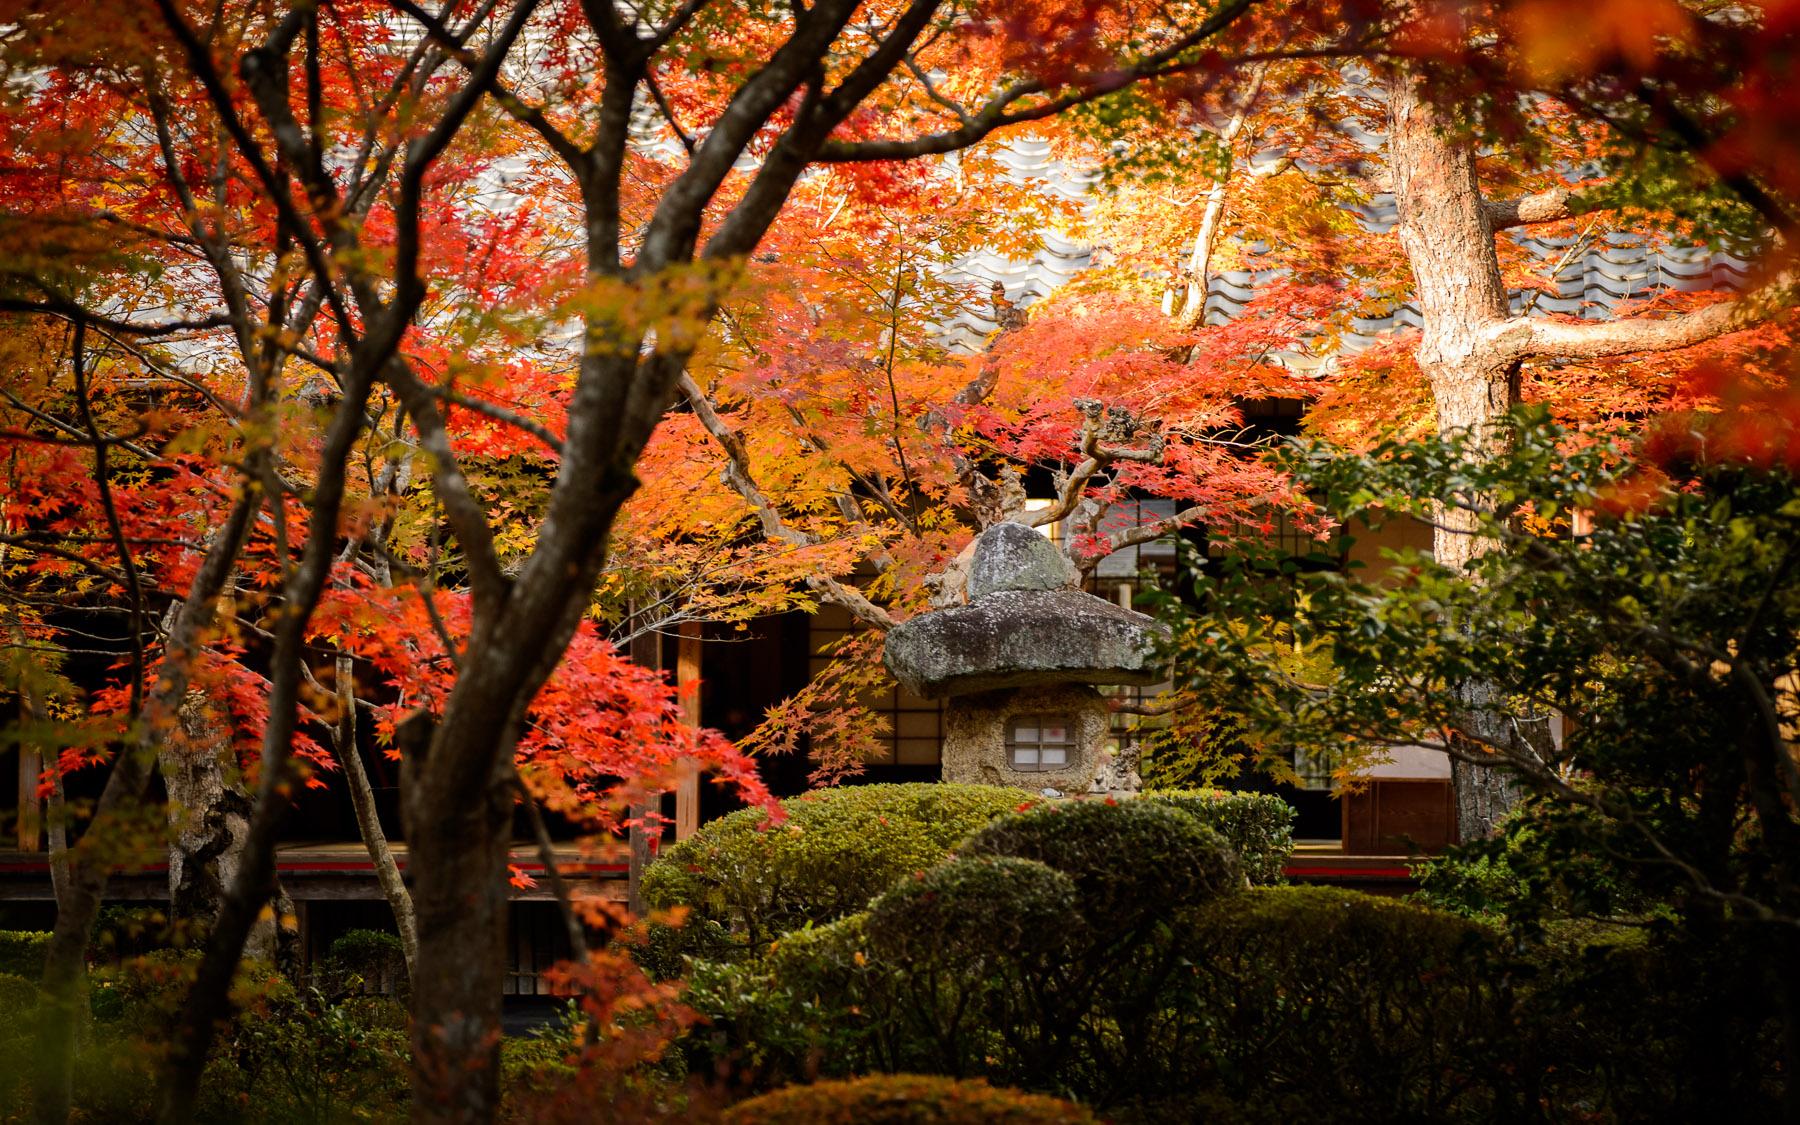 Free Fall Waterfall Desktop Wallpaper Jeffrey Friedl S Blog 187 The Gorgeous Enkouji Temple Of